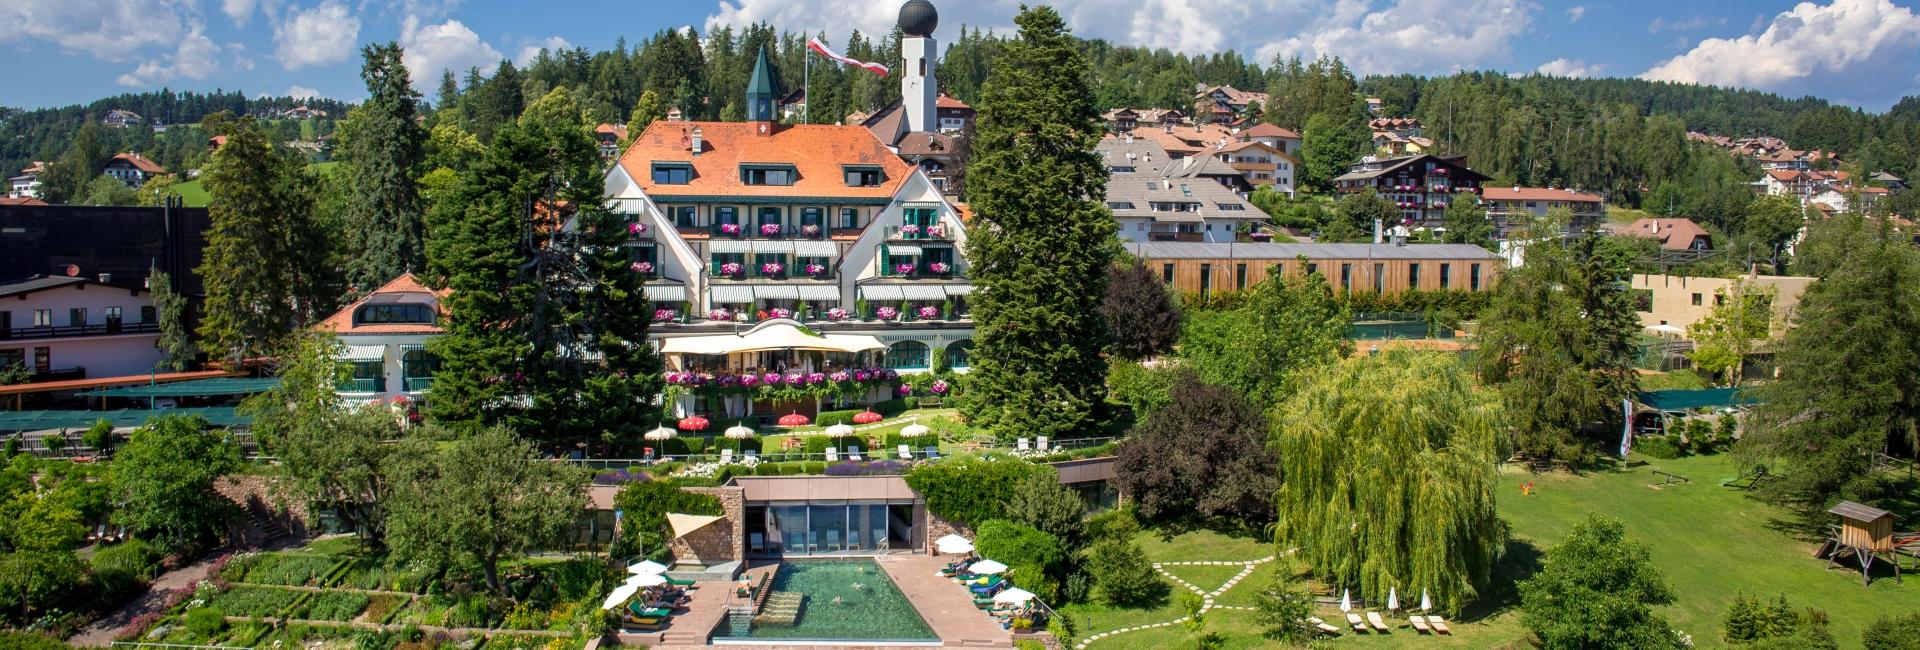 Parkhotel Holzner (c) Armin Mayr